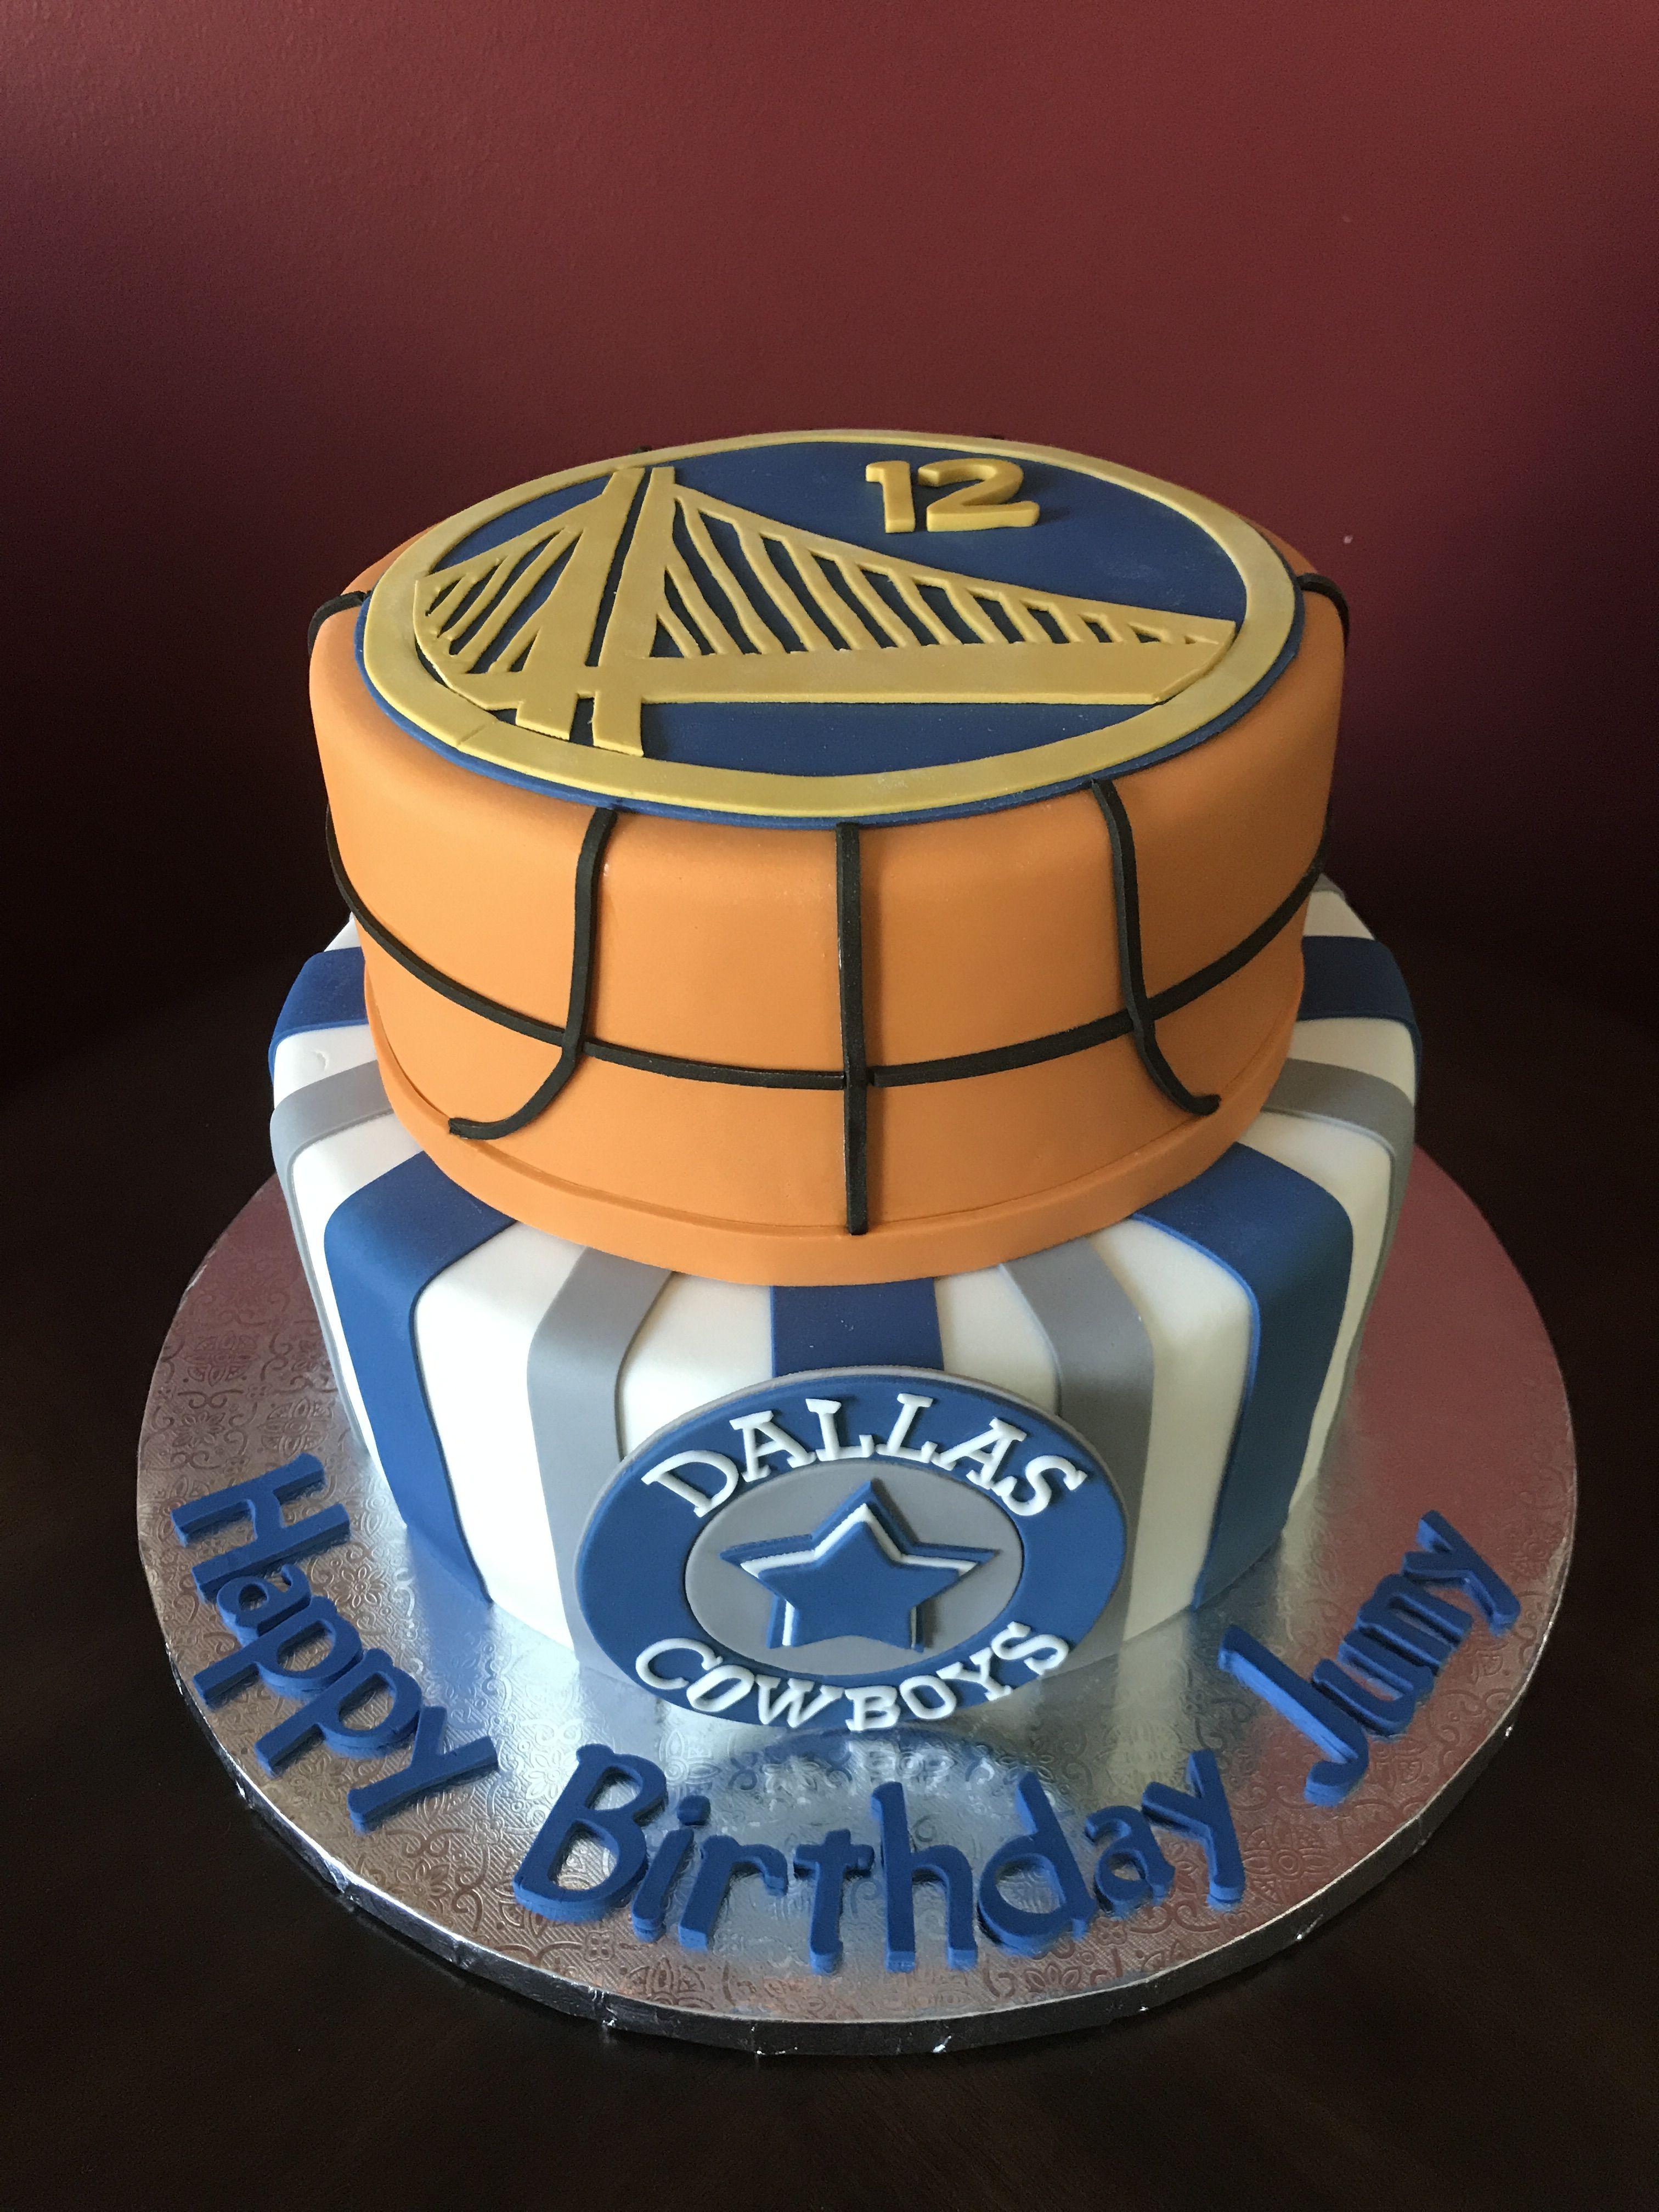 Golden State Warriors Dallas Cowboys Birthday Cake Birthday Cakes